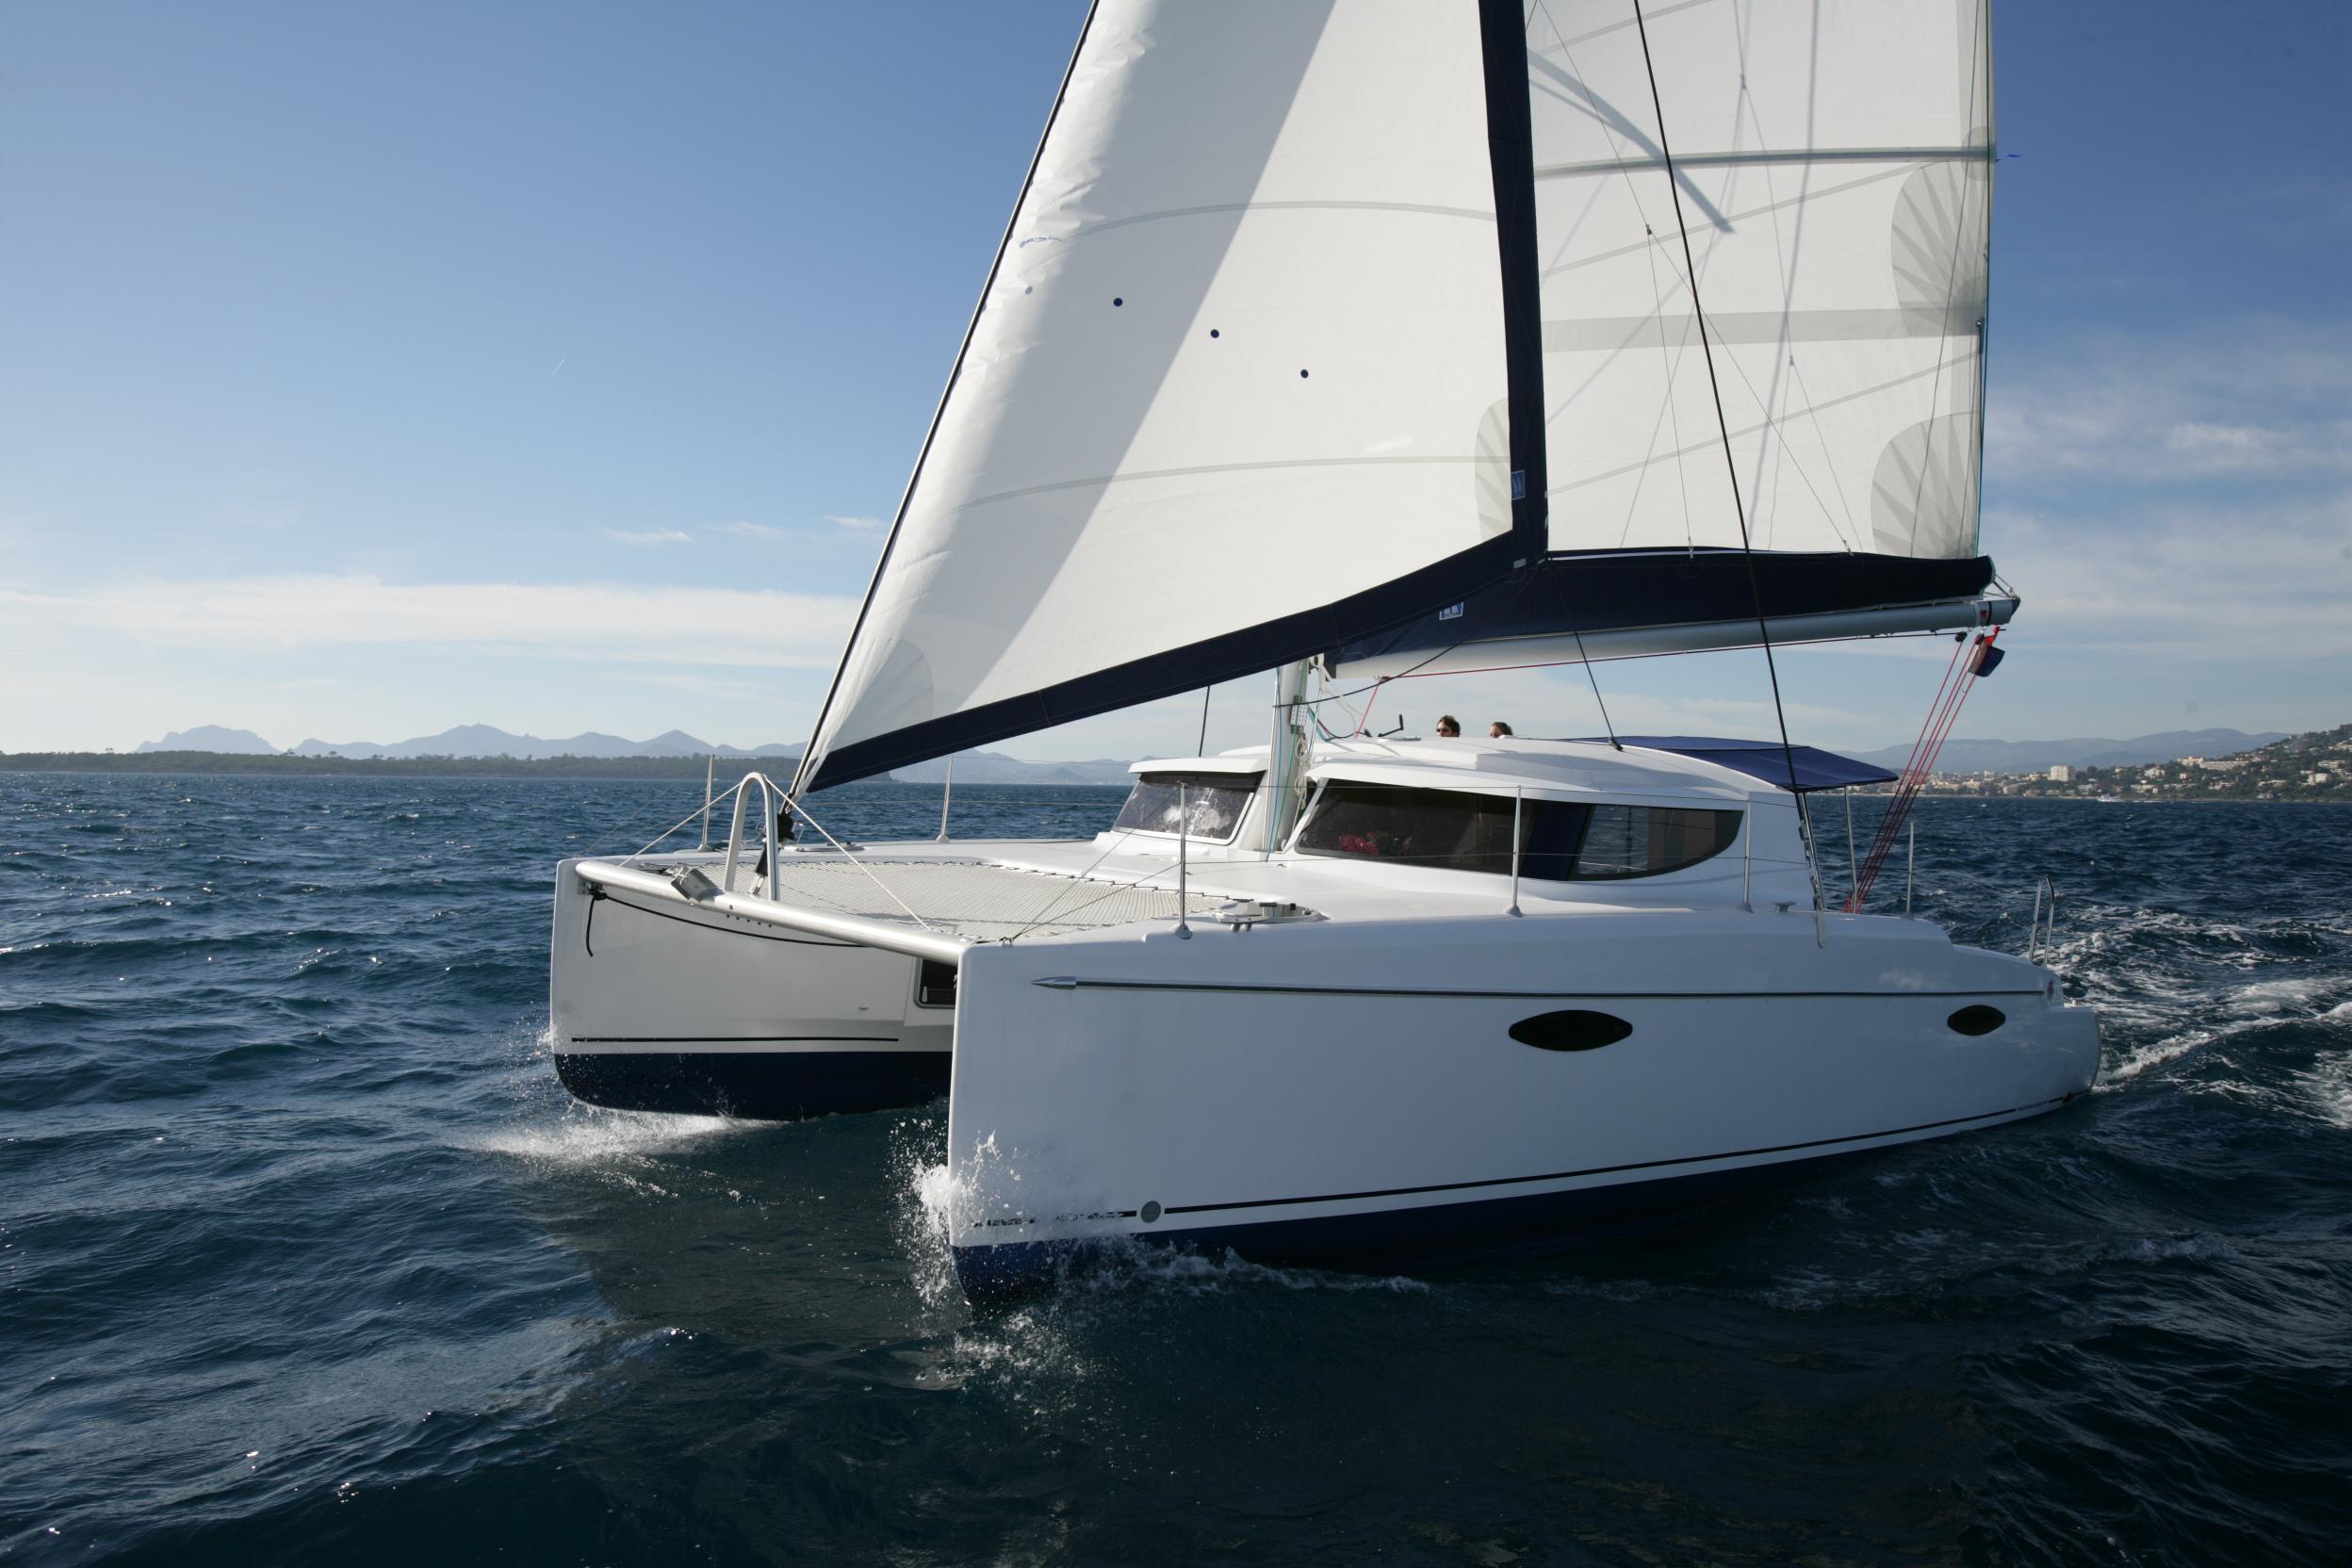 Fountaine Pajot France 2010 Mahe 36 Evolution Catamara — Yacht Charter & Superyacht News